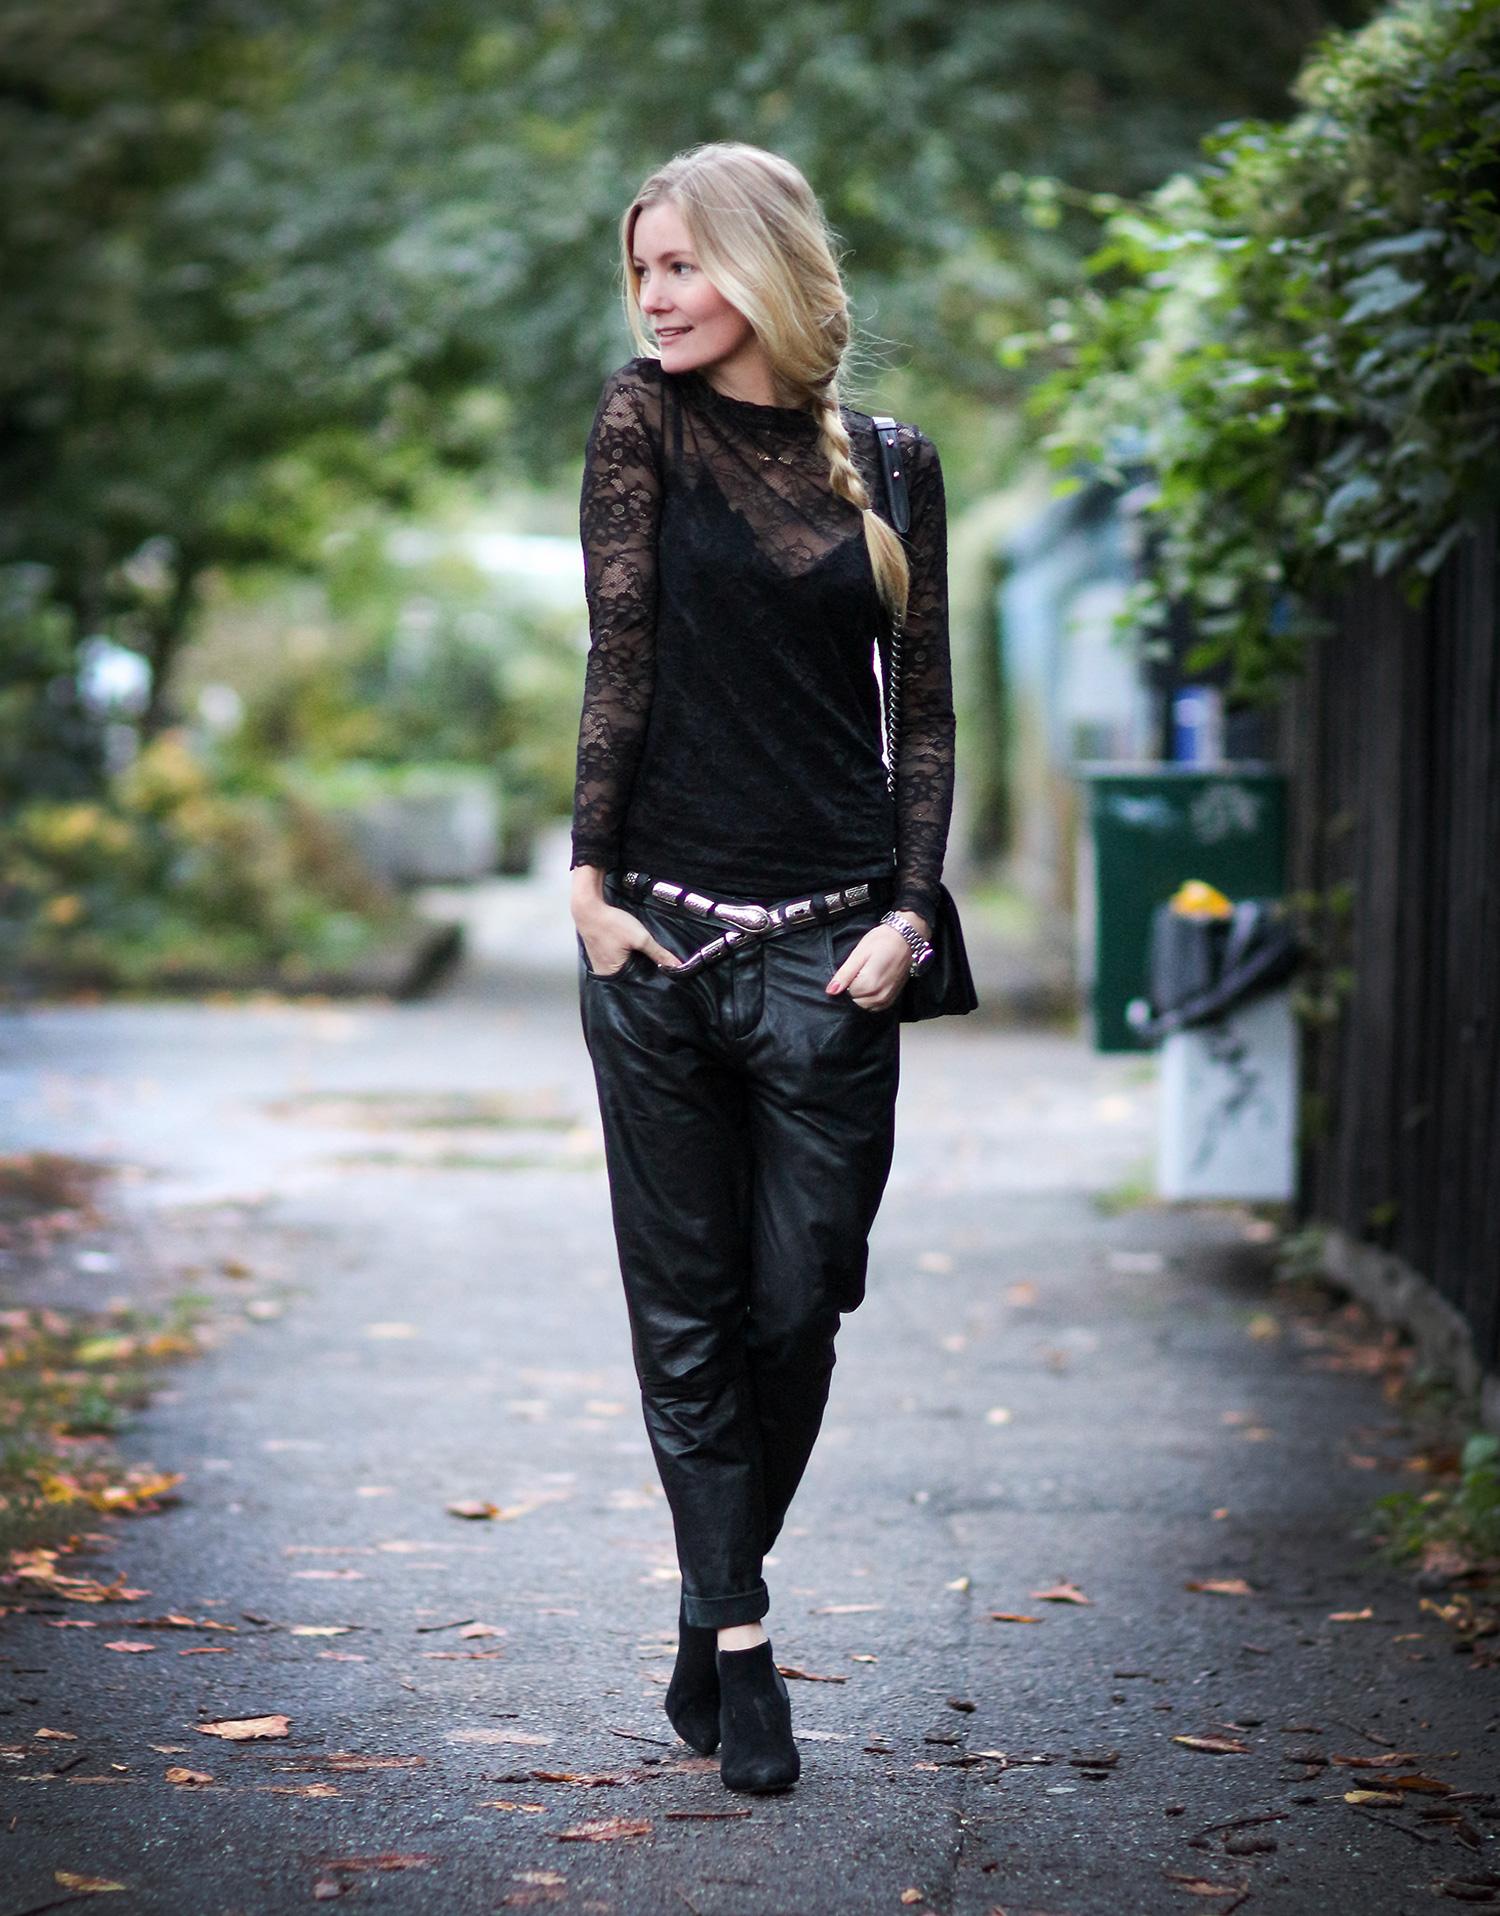 blondetop-rosemunde@2x